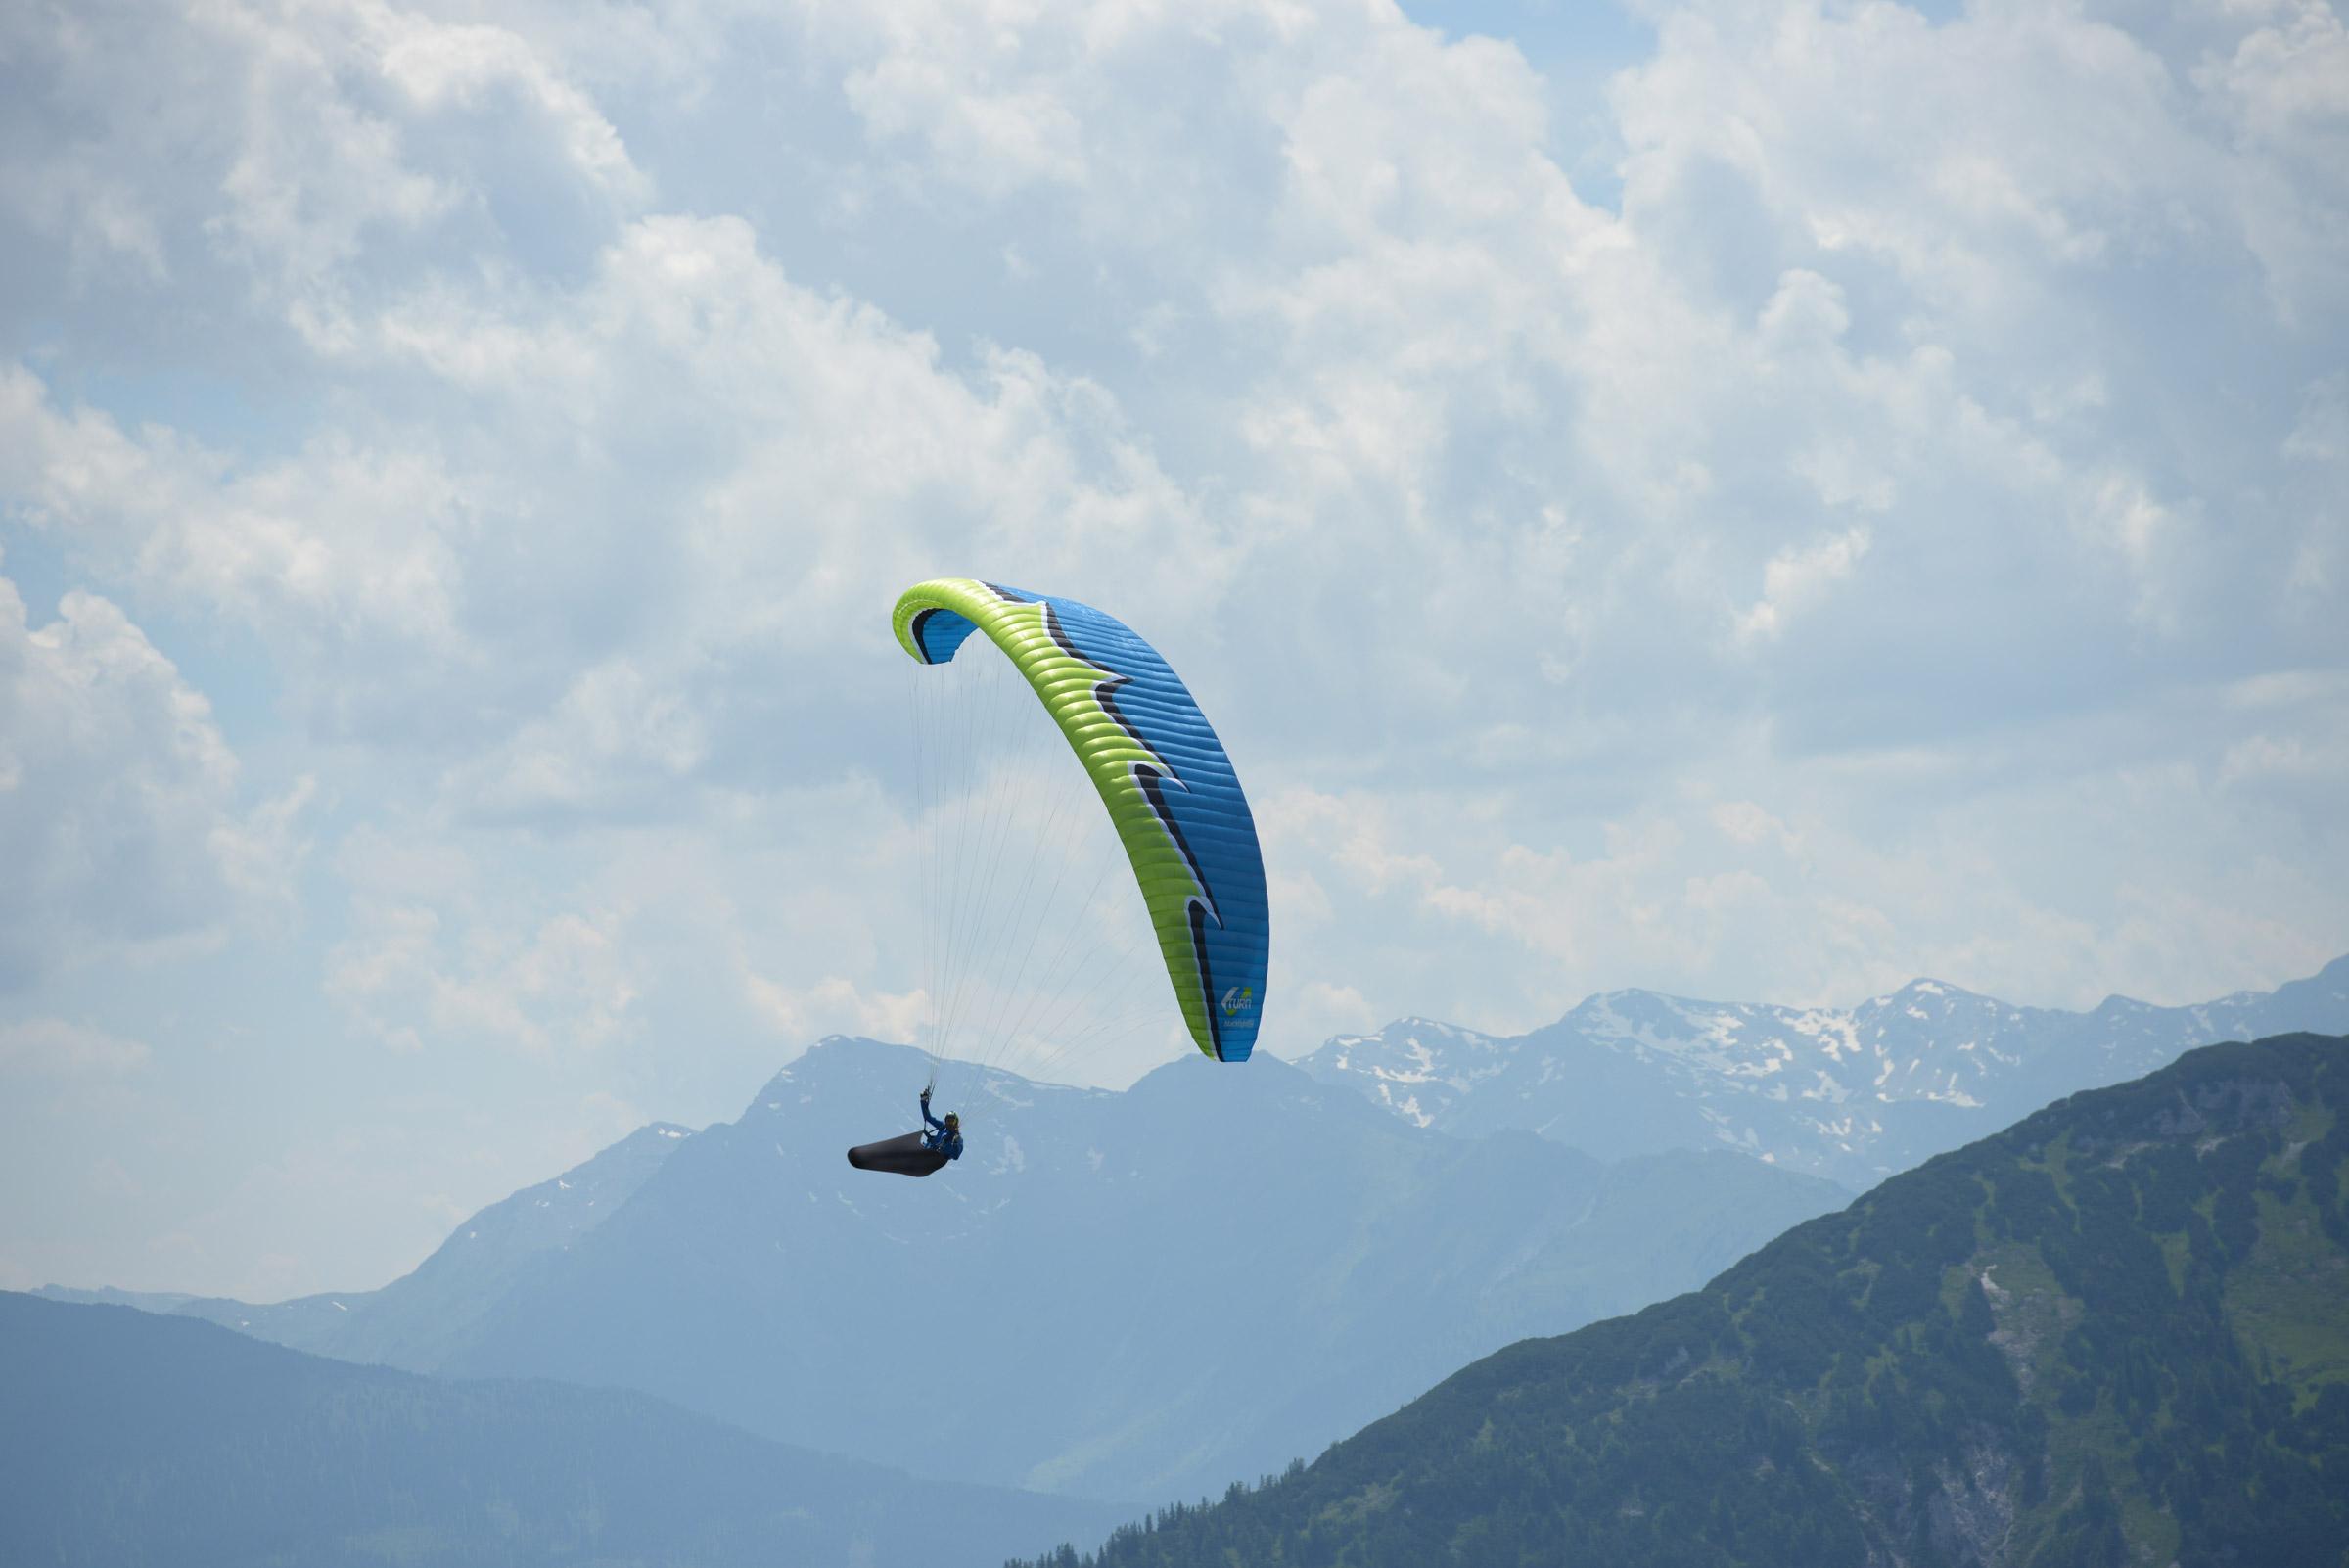 U-Turn Paragliders - Blacklight2 and Crossrock - Sunsoar